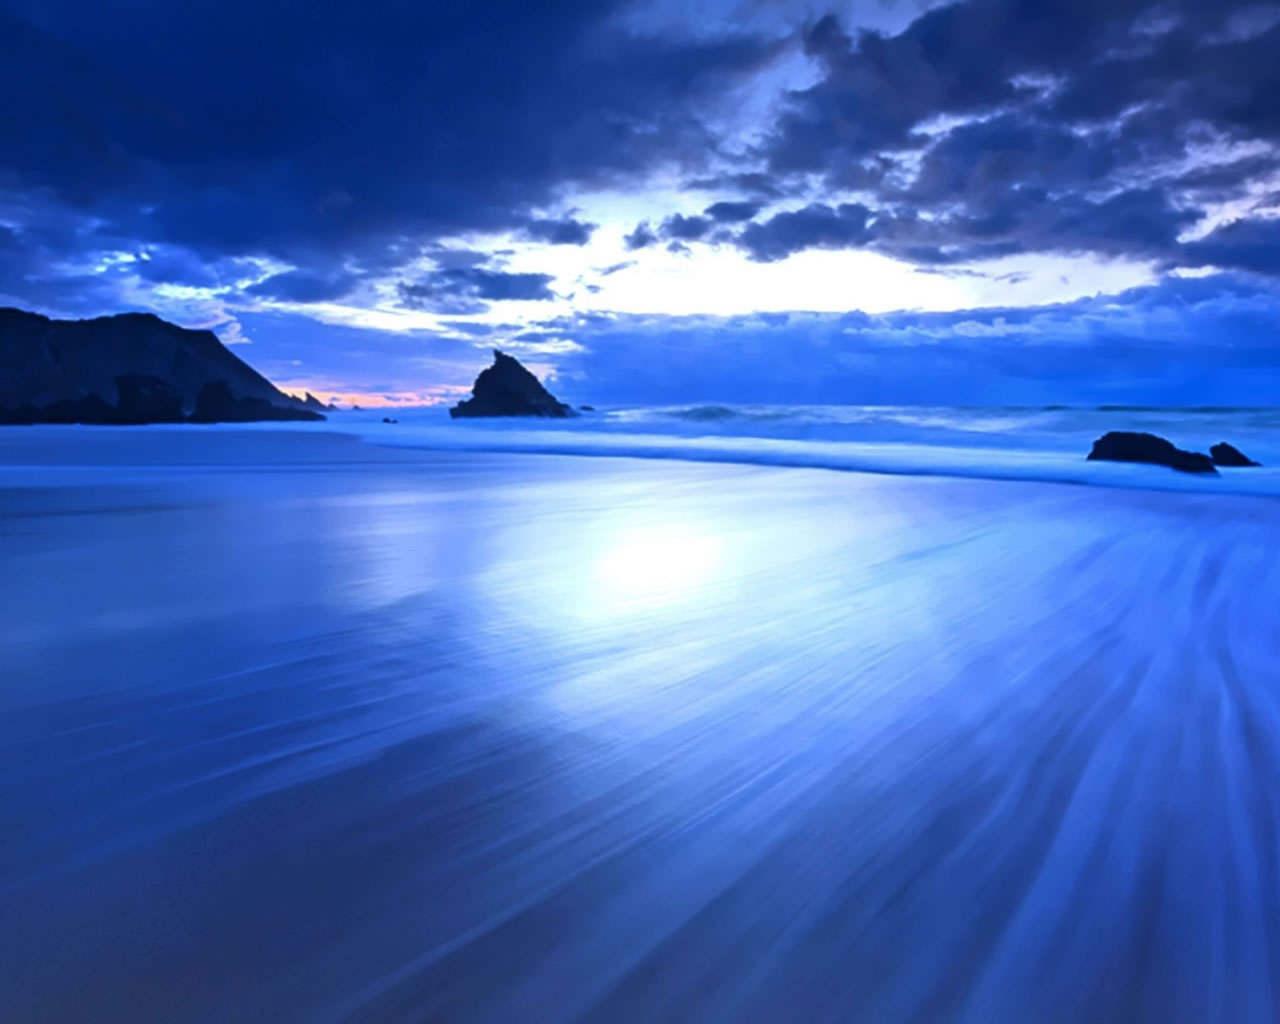 Beach Scene | Elegant Moments